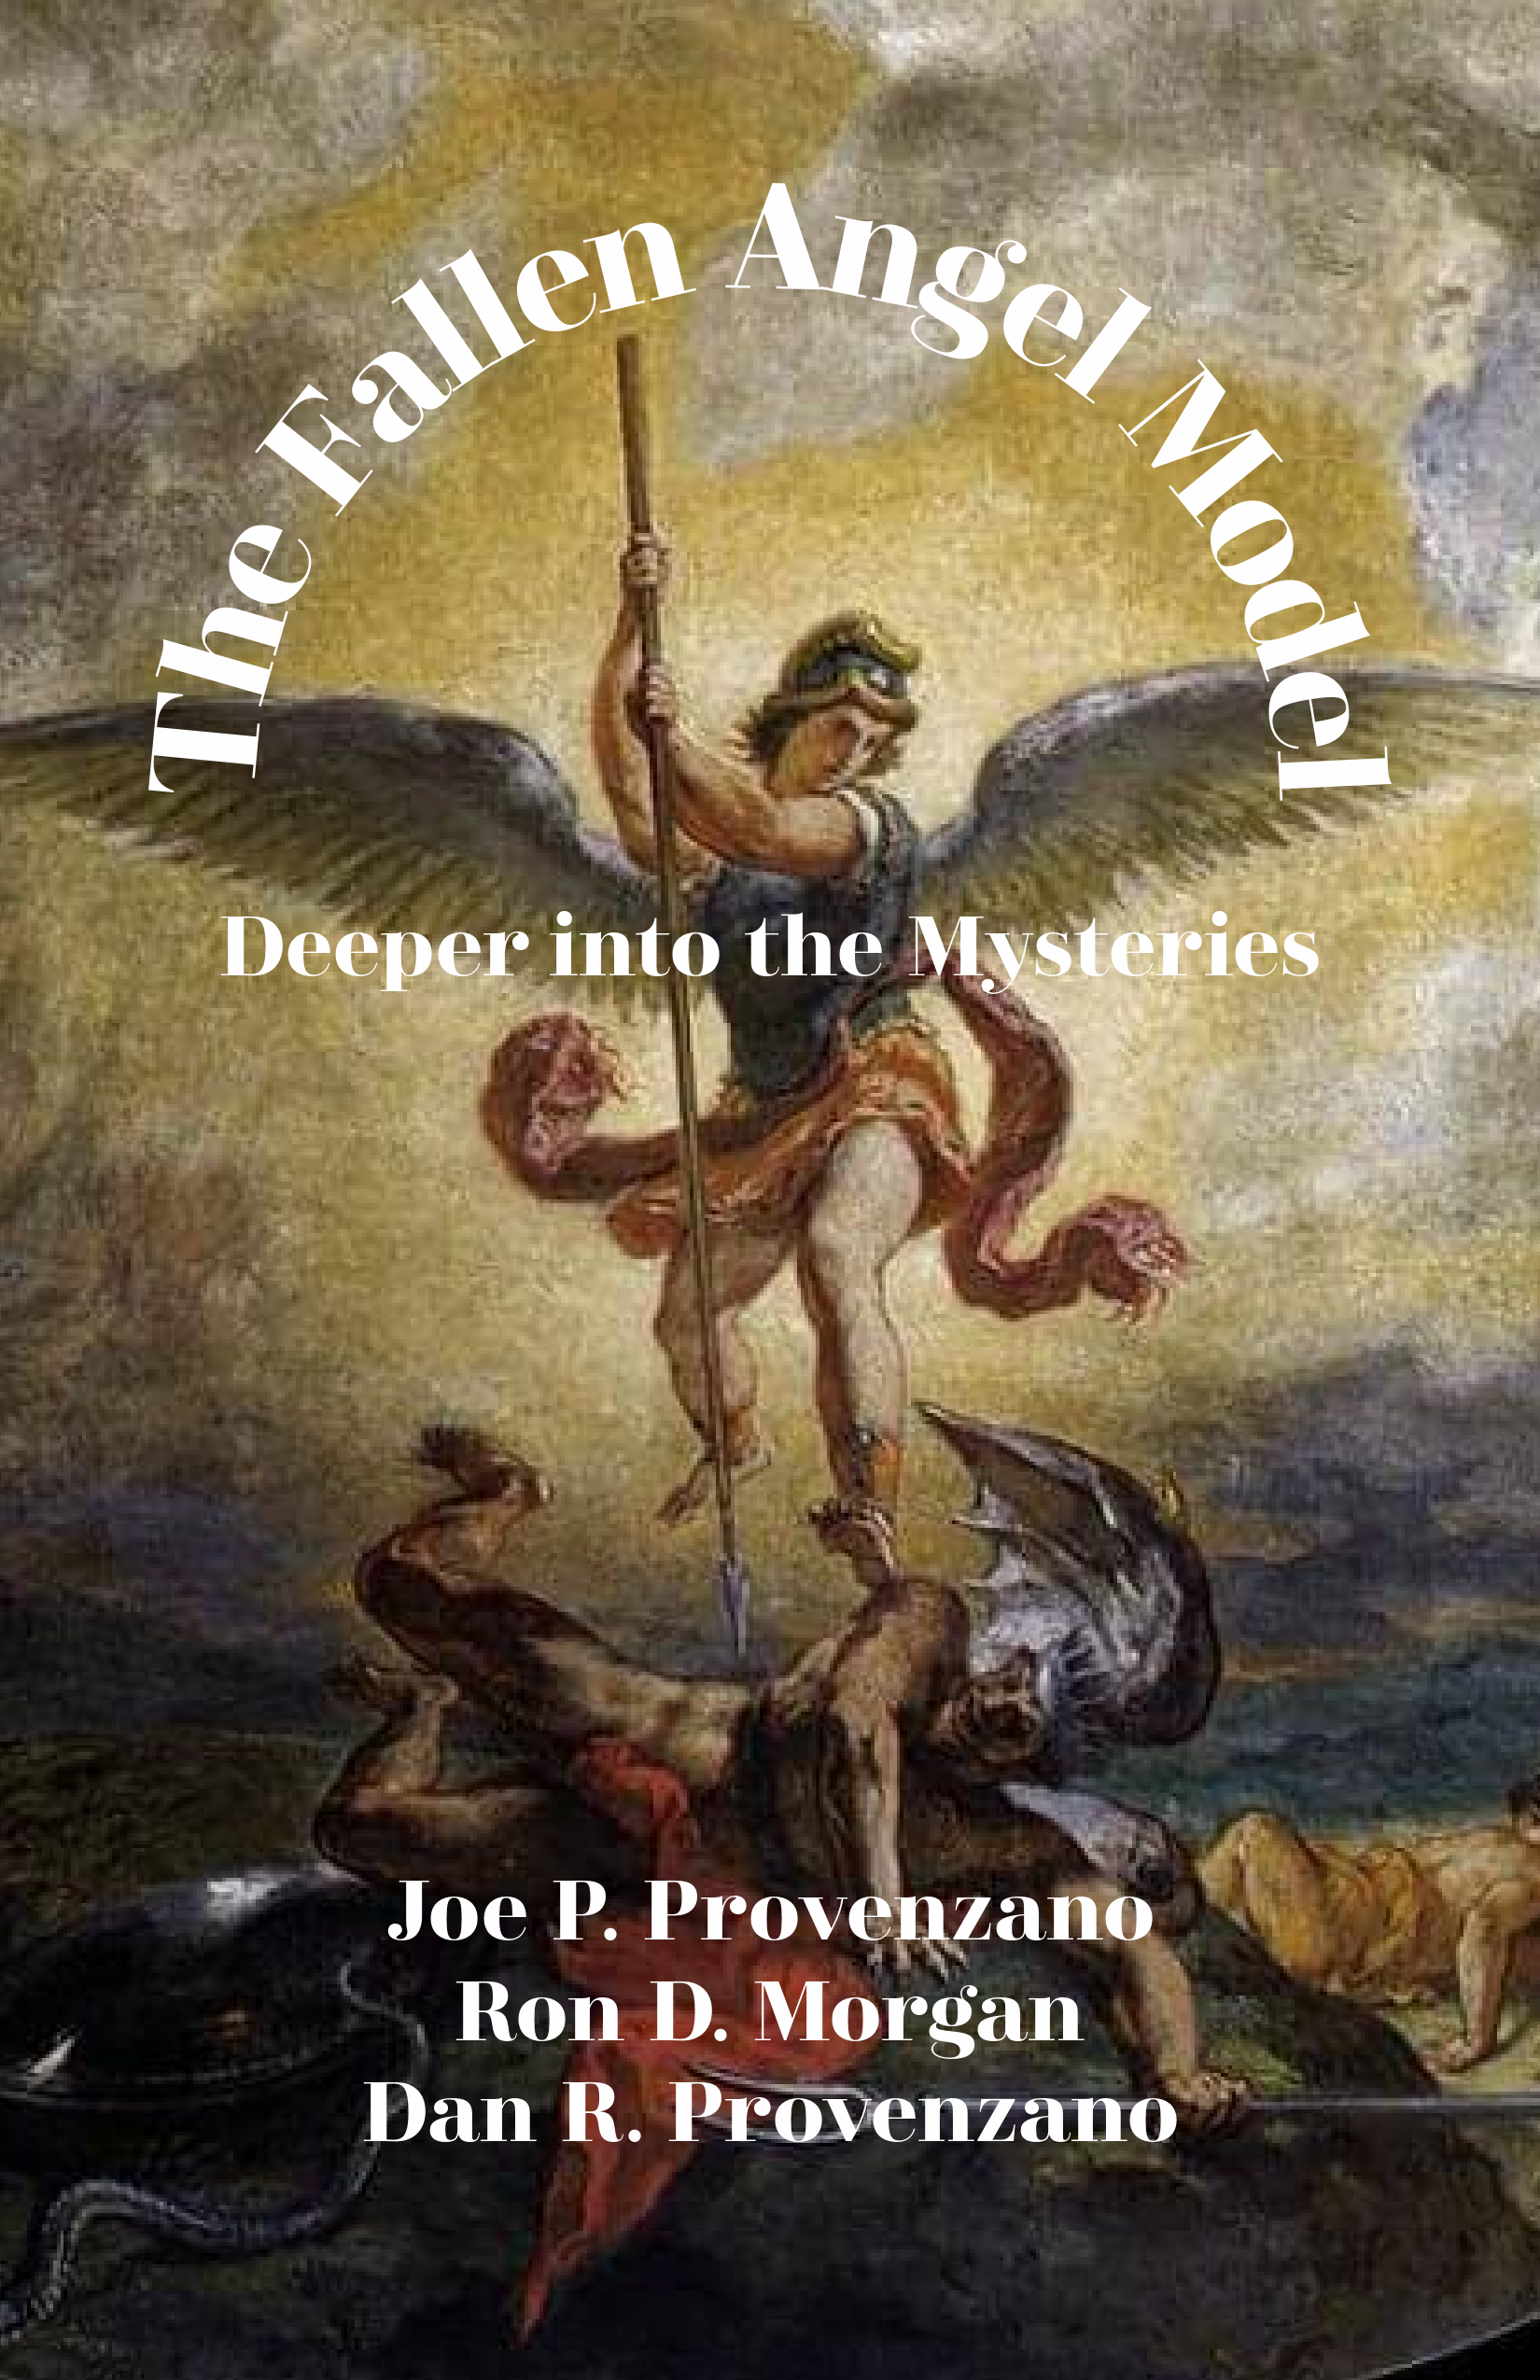 The Fallen Angel Model: Deeper into the Mysteries